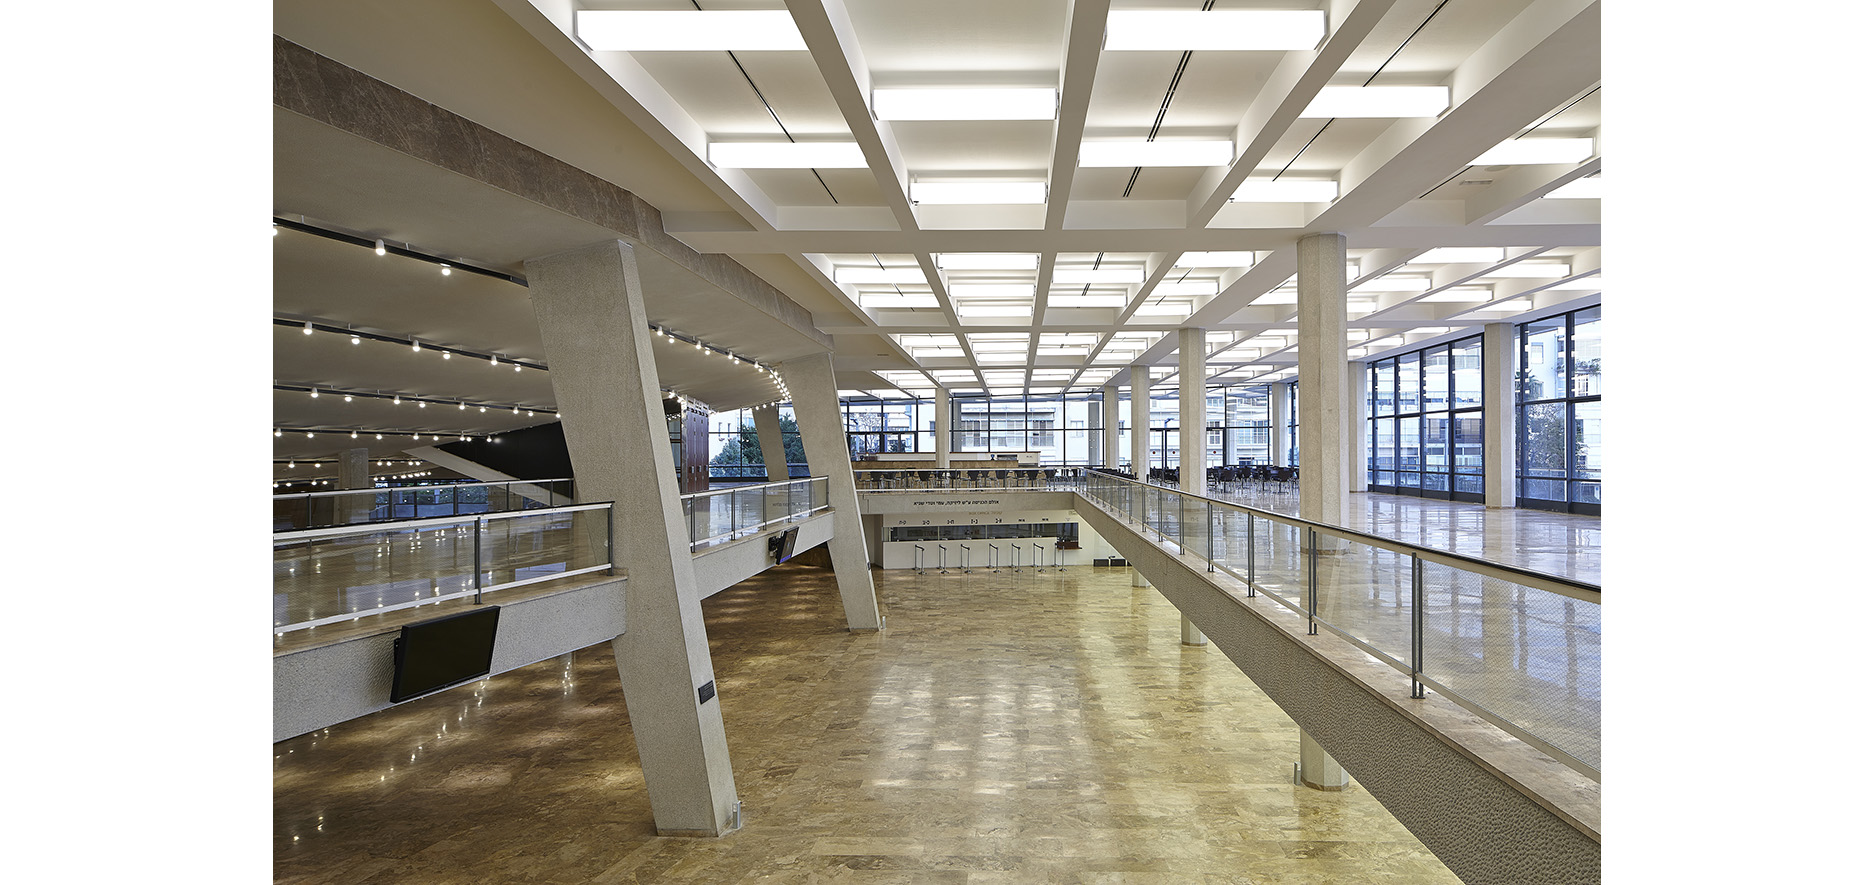 Heichal_HaTarbut_TLV_By_Kolker_Epstein_Architects003